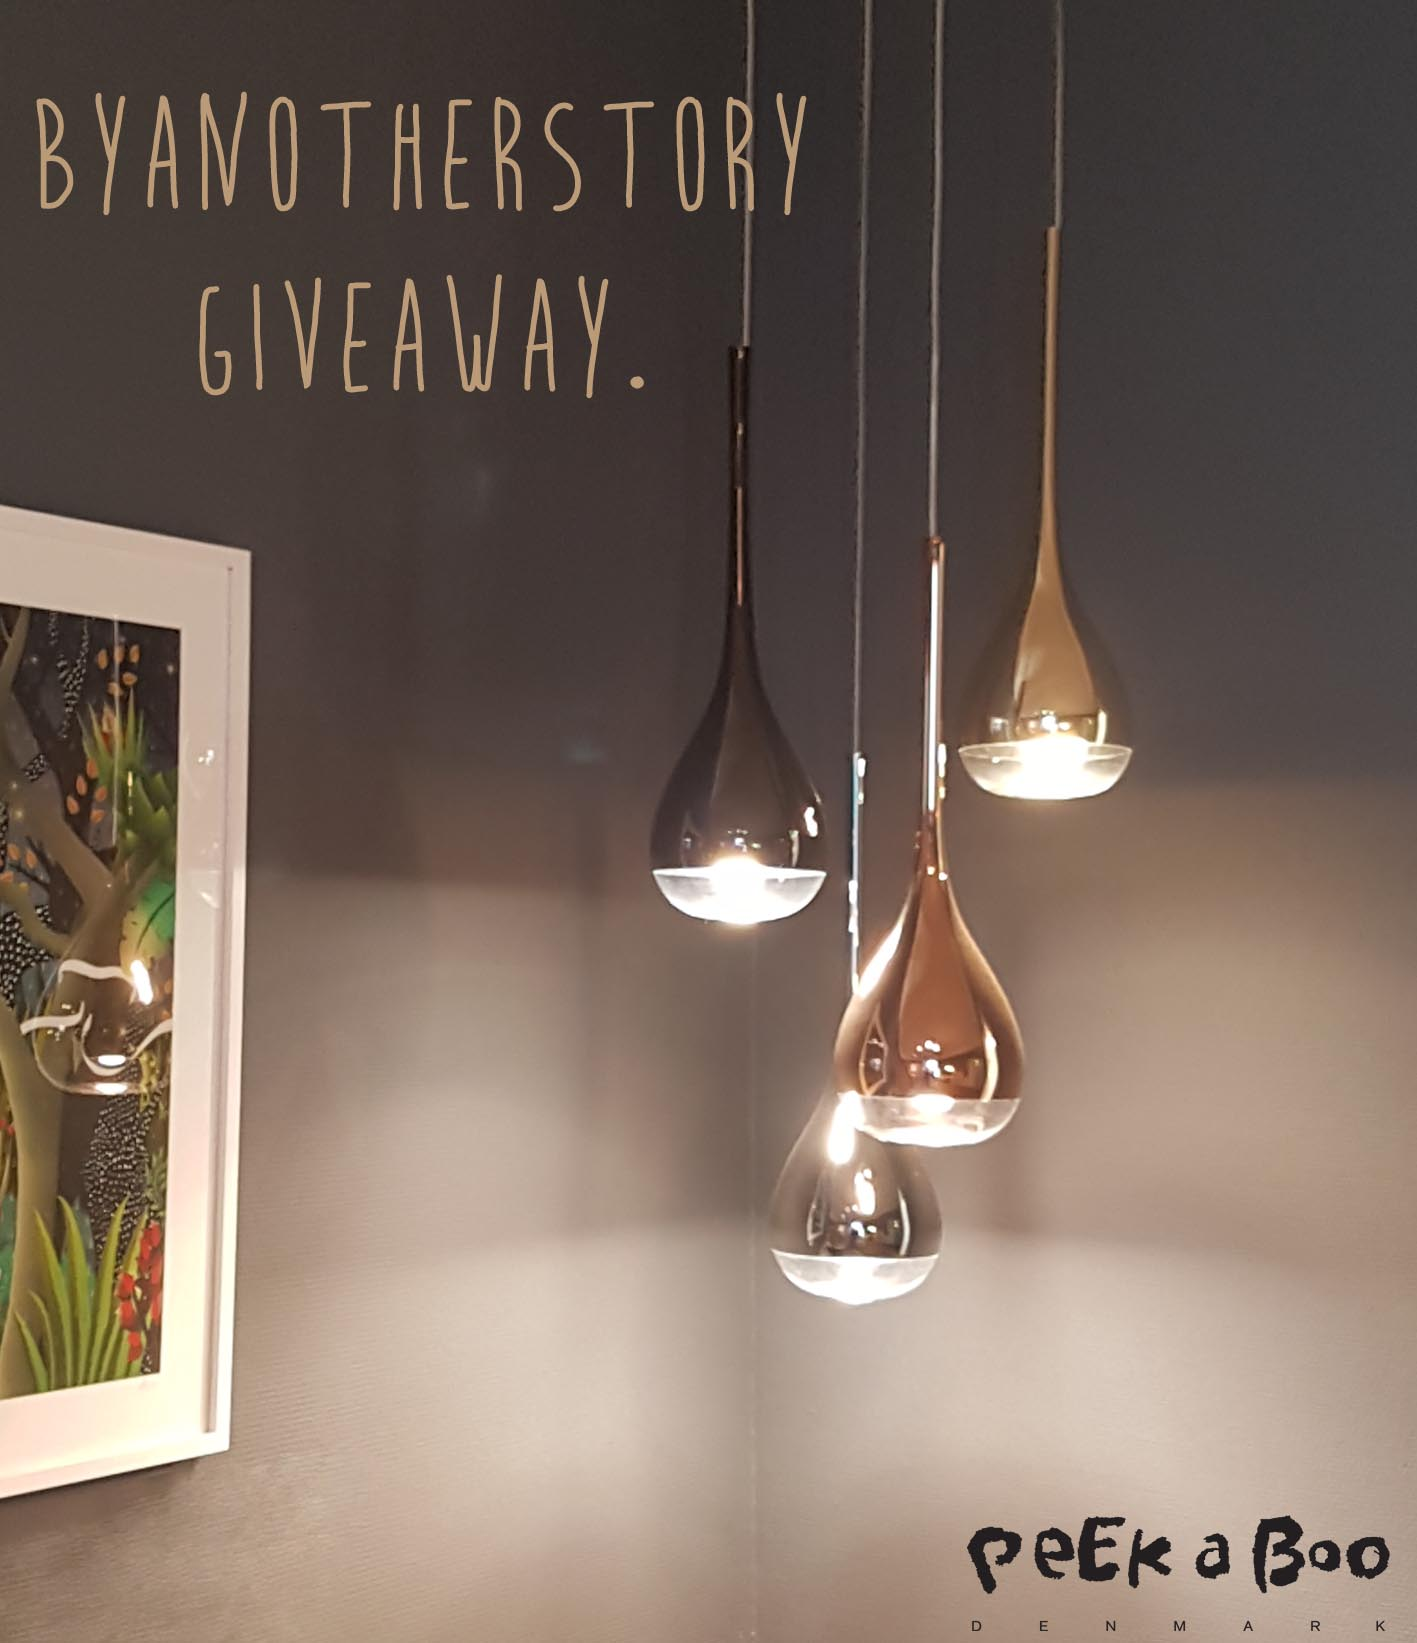 Eksklusiv Lampe Giveaway Give Away Peekaboo Design